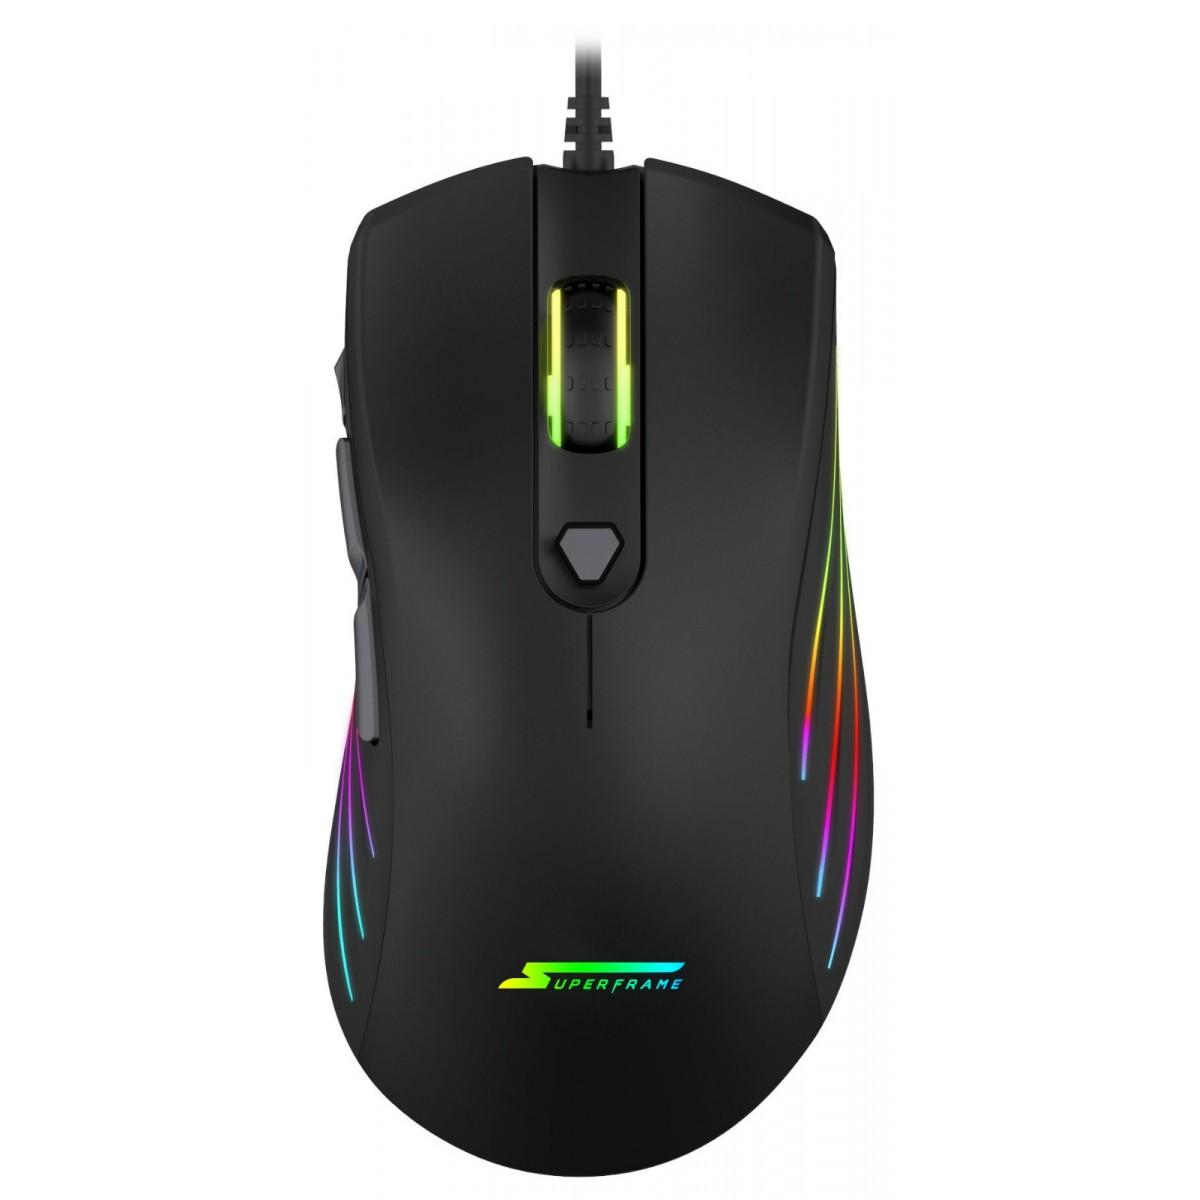 Mouse Gamer SuperFrame, BIG BOSS, 12000 DPI, RGB, 7 Botões, Black, Sensor Pixart 3360